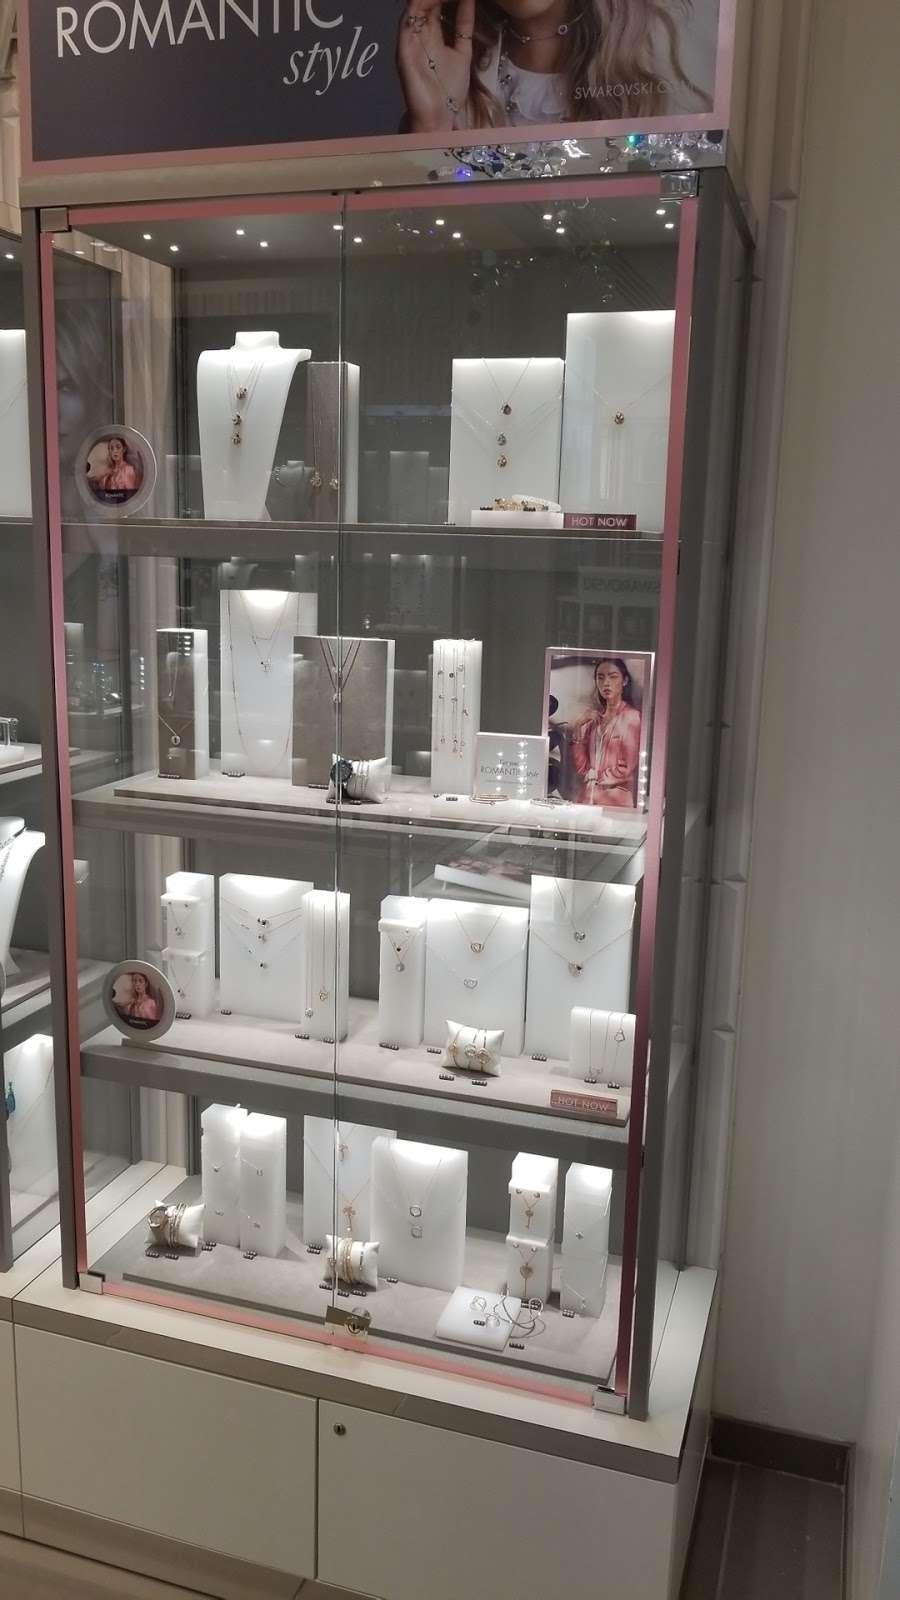 SWAROVSKI - jewelry store  | Photo 3 of 5 | Address: La Guardia Airport Delta Terminal C, East Elmhurst, NY 11371, USA | Phone: (929) 202-4092